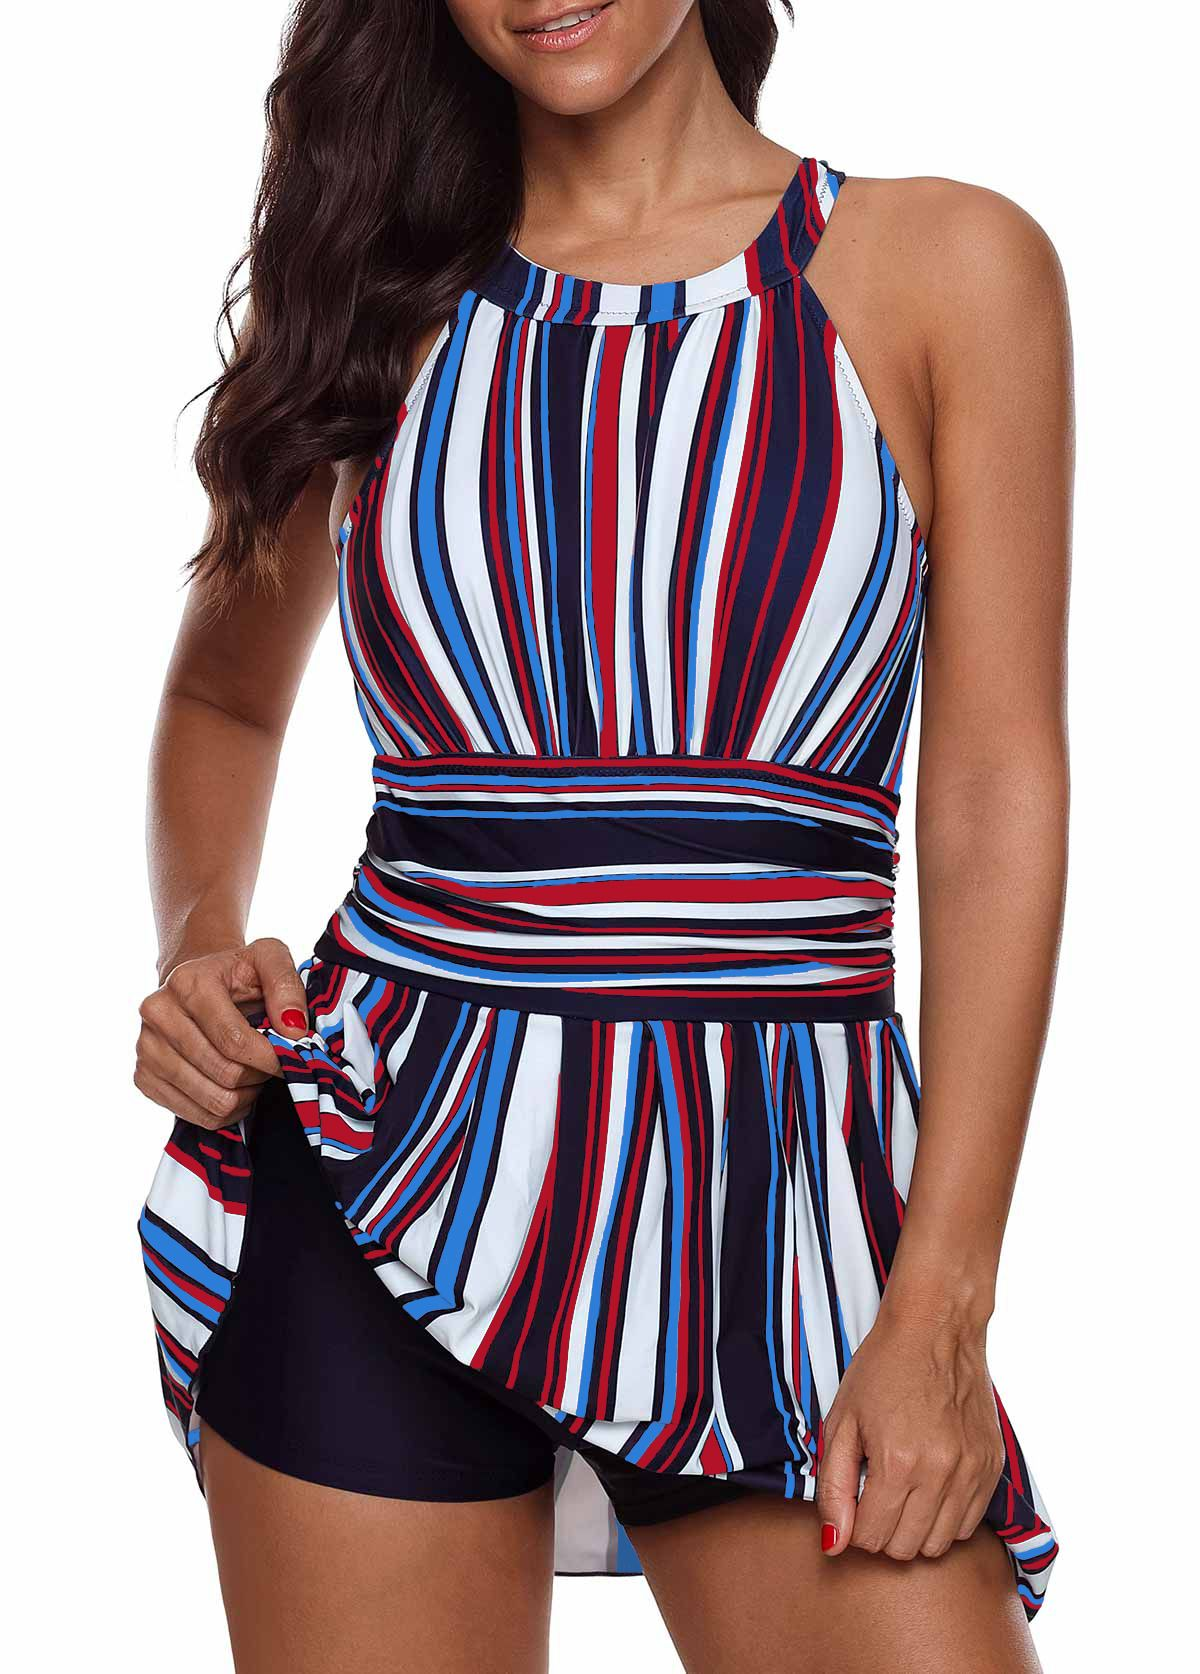 c729eeae46b19 Cutout Back Multicolor Striped Padded Swimdress and Shorts #liligal # swimwear #swimsuit